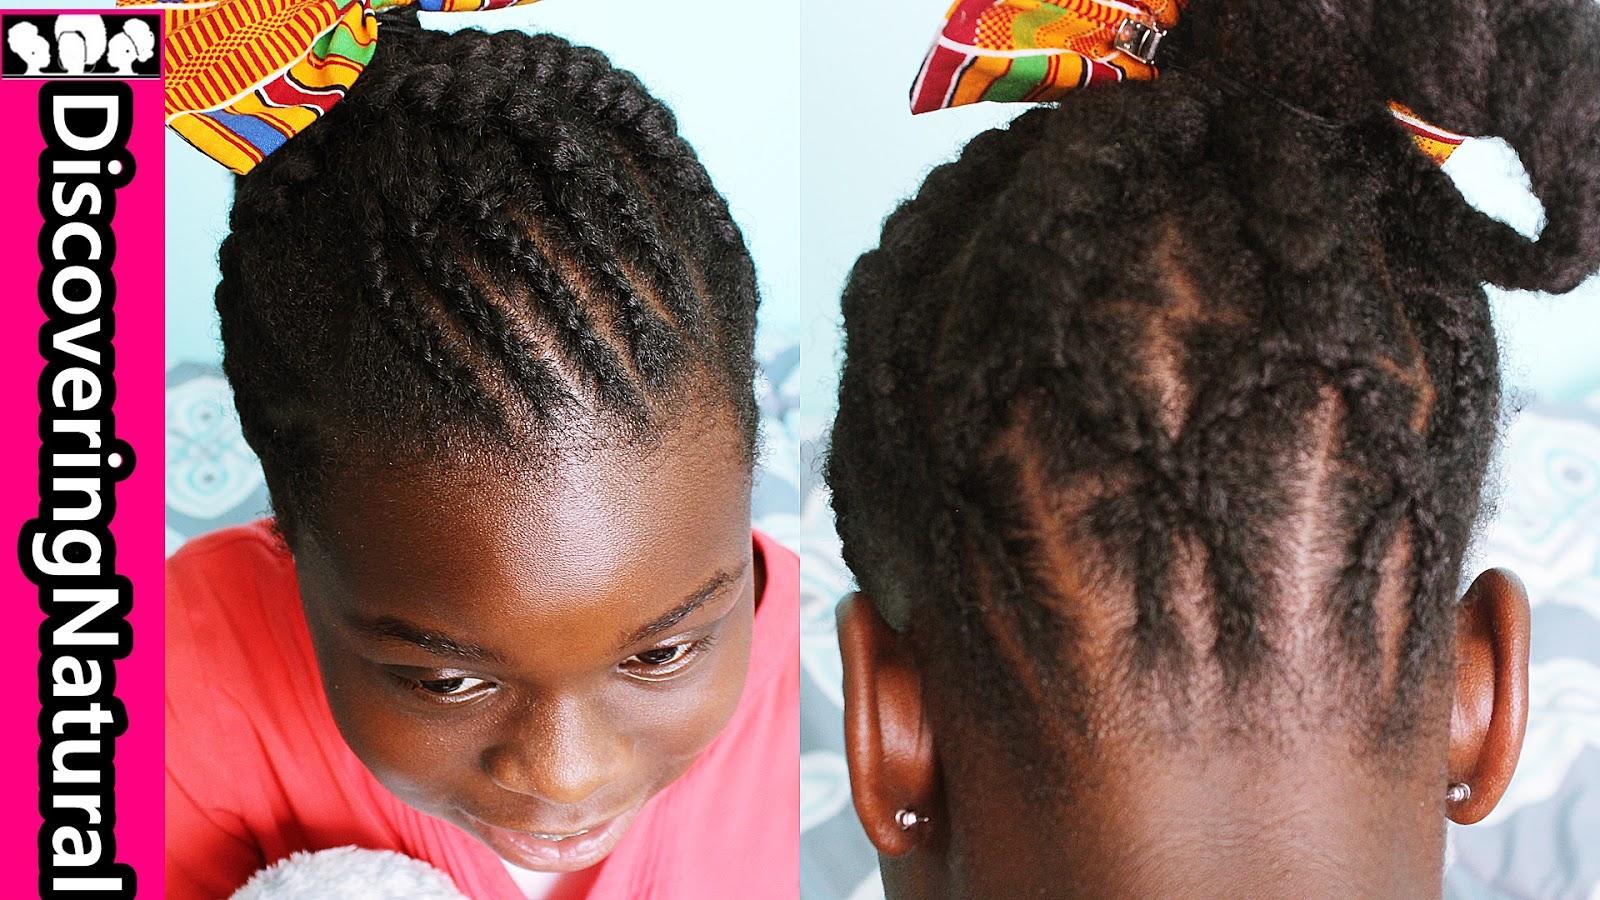 Discoveringnatural Natural Hair Kids Hairstyle Big And Small